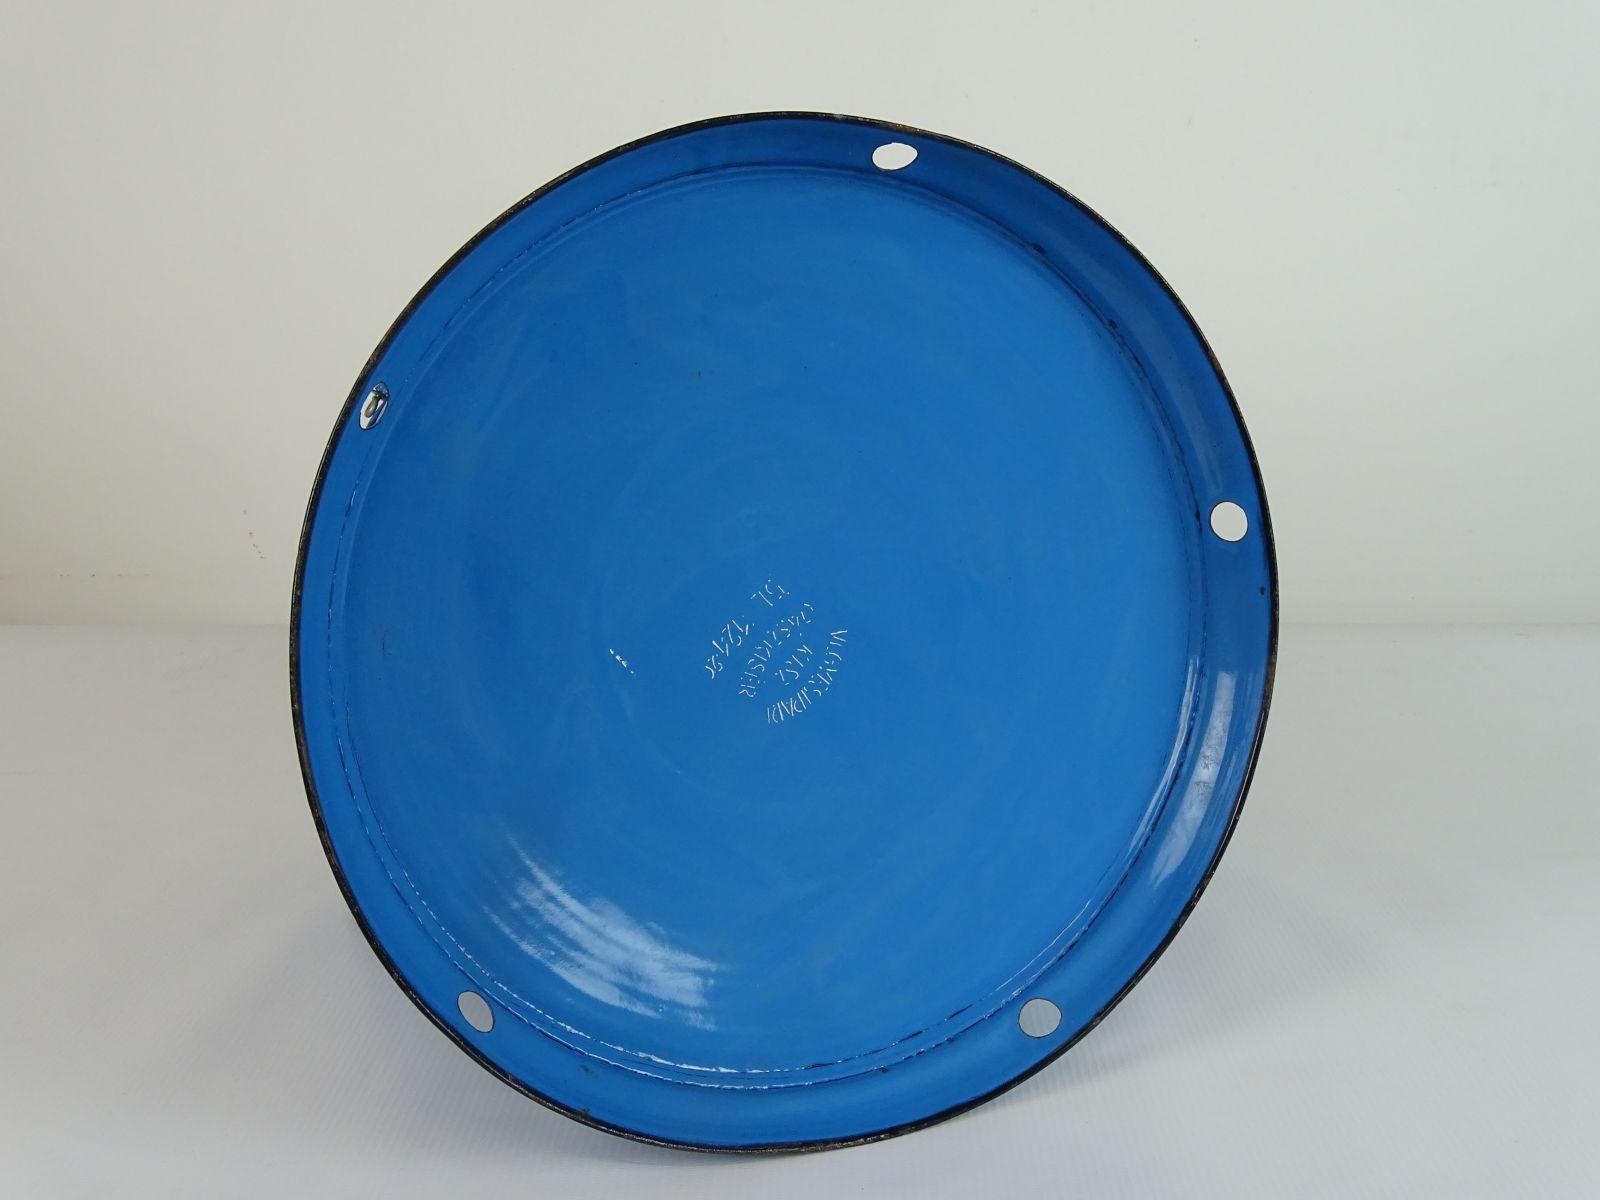 DSC04060.JPG (1600×1200)